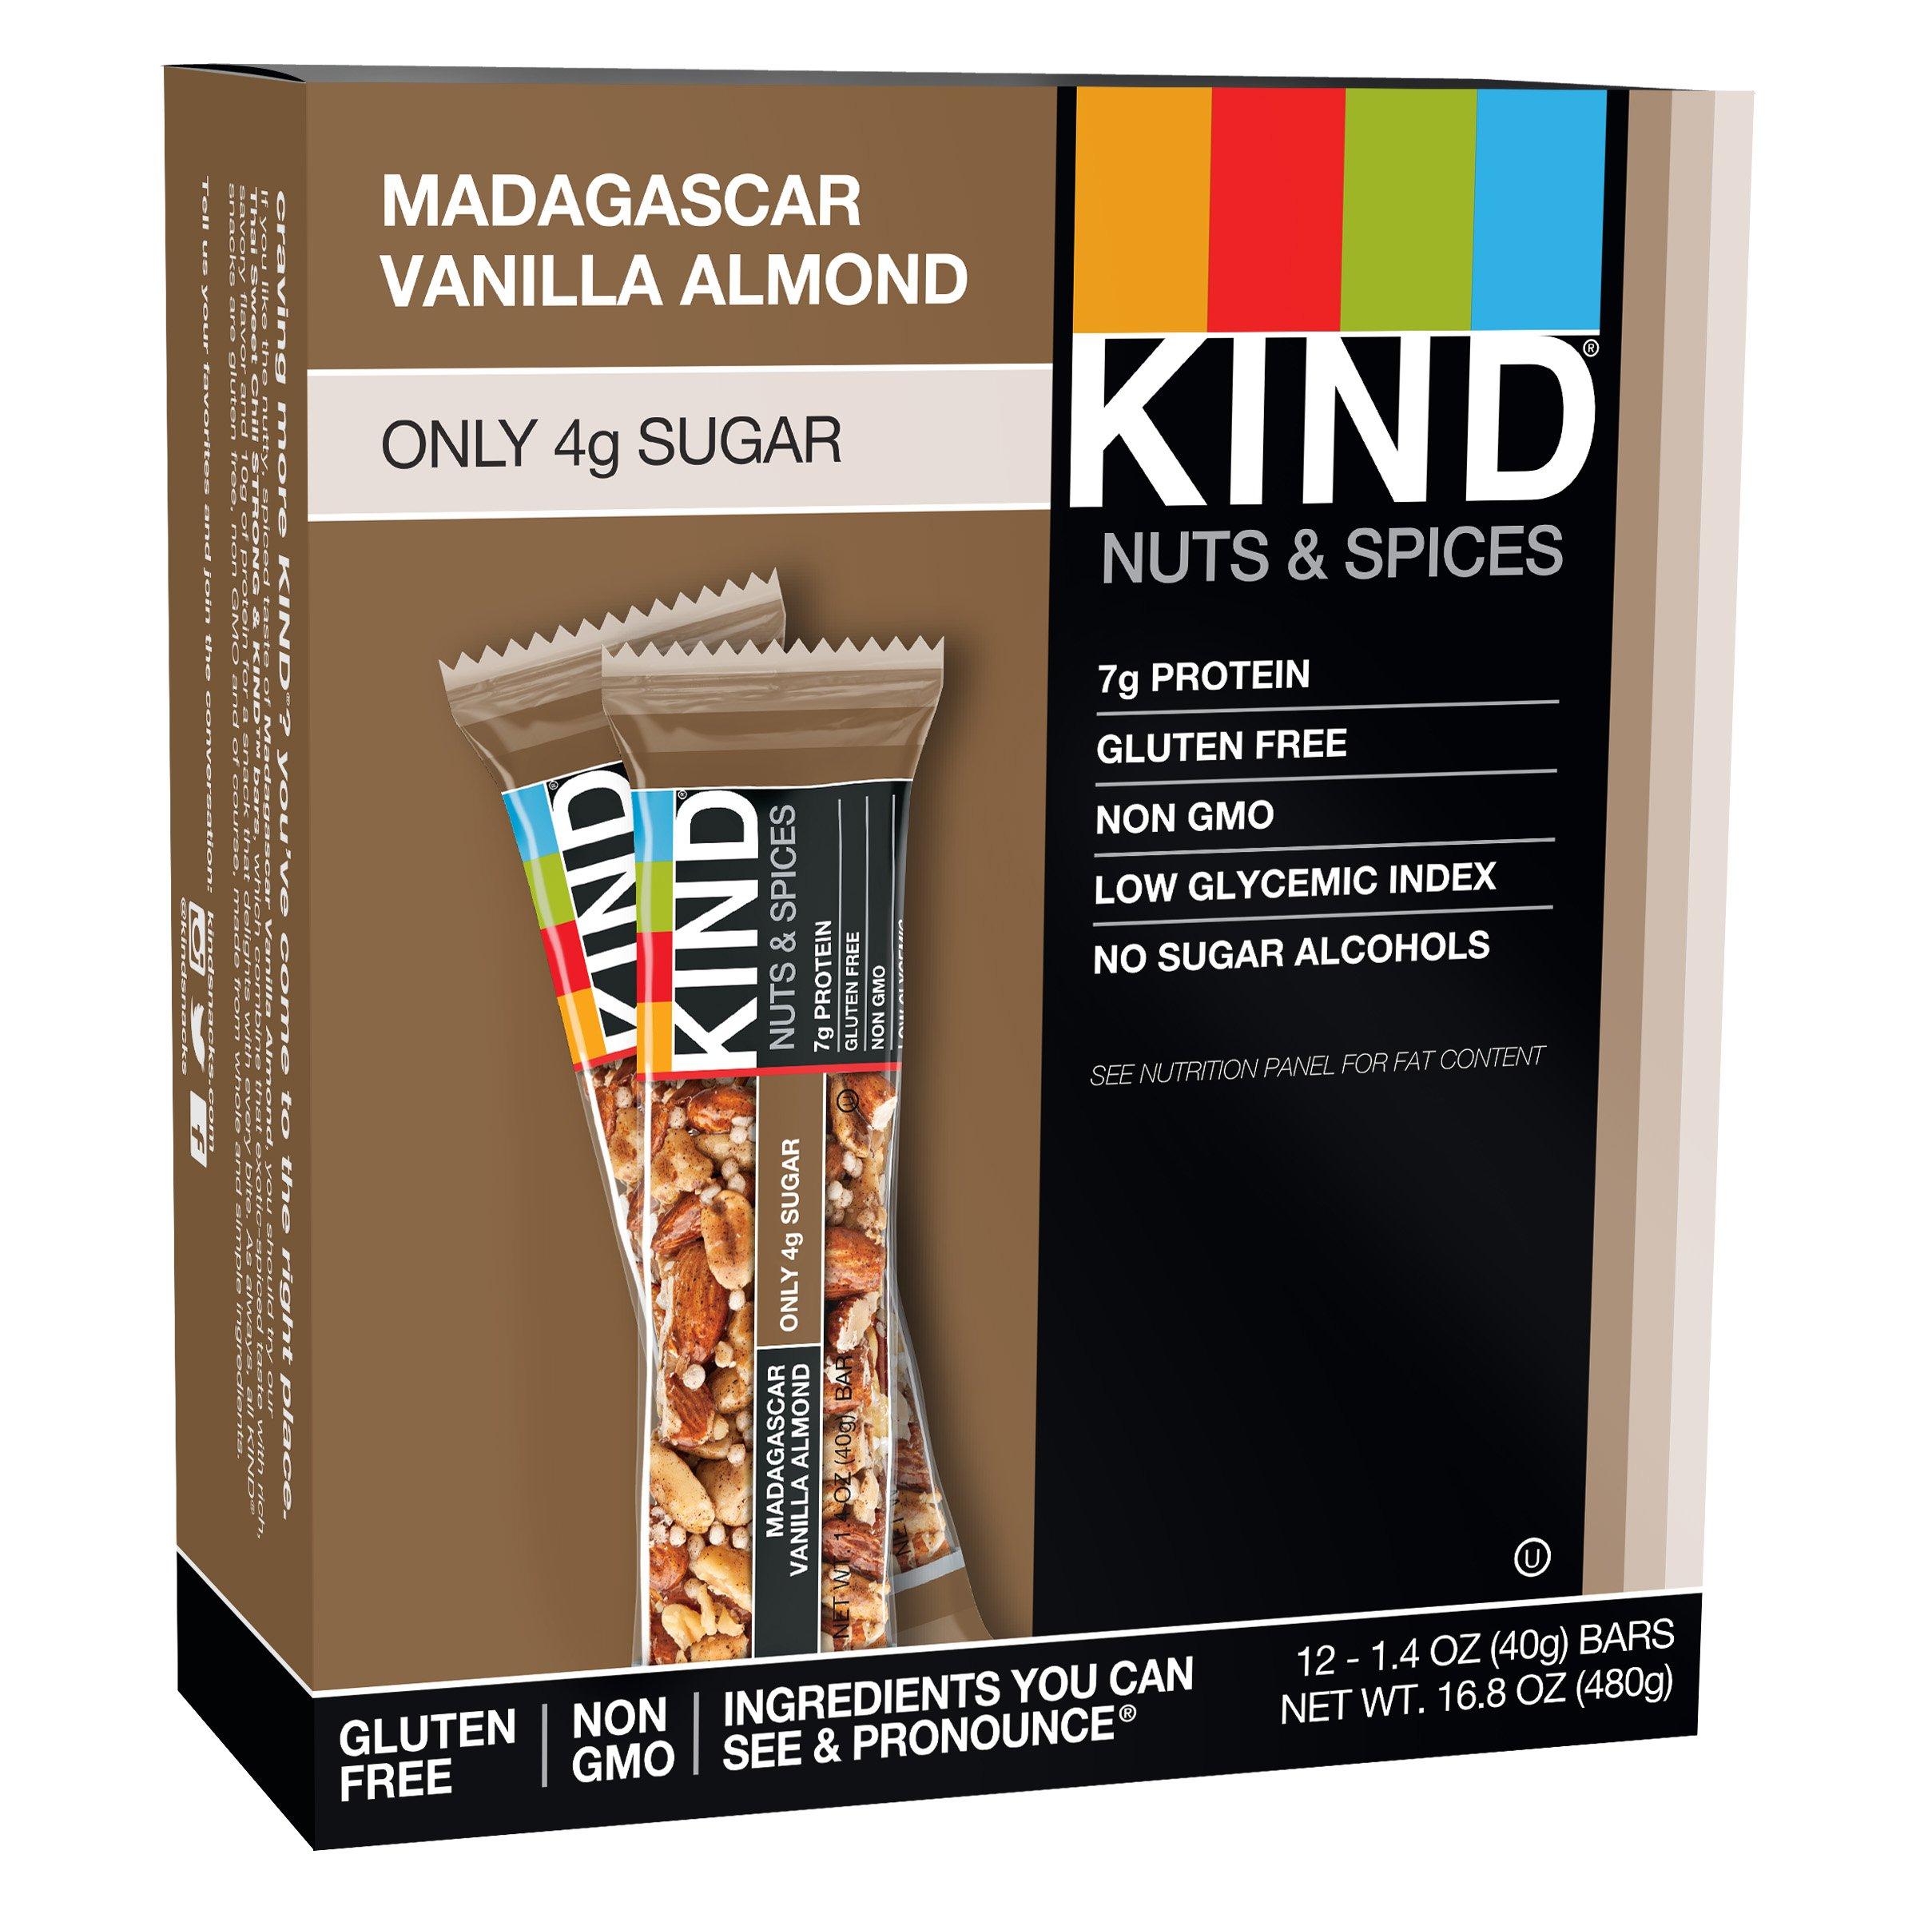 KIND Nuts & Spices, Madagascar Vanilla Almond, 12-Count ,1.4 Ounce Bars